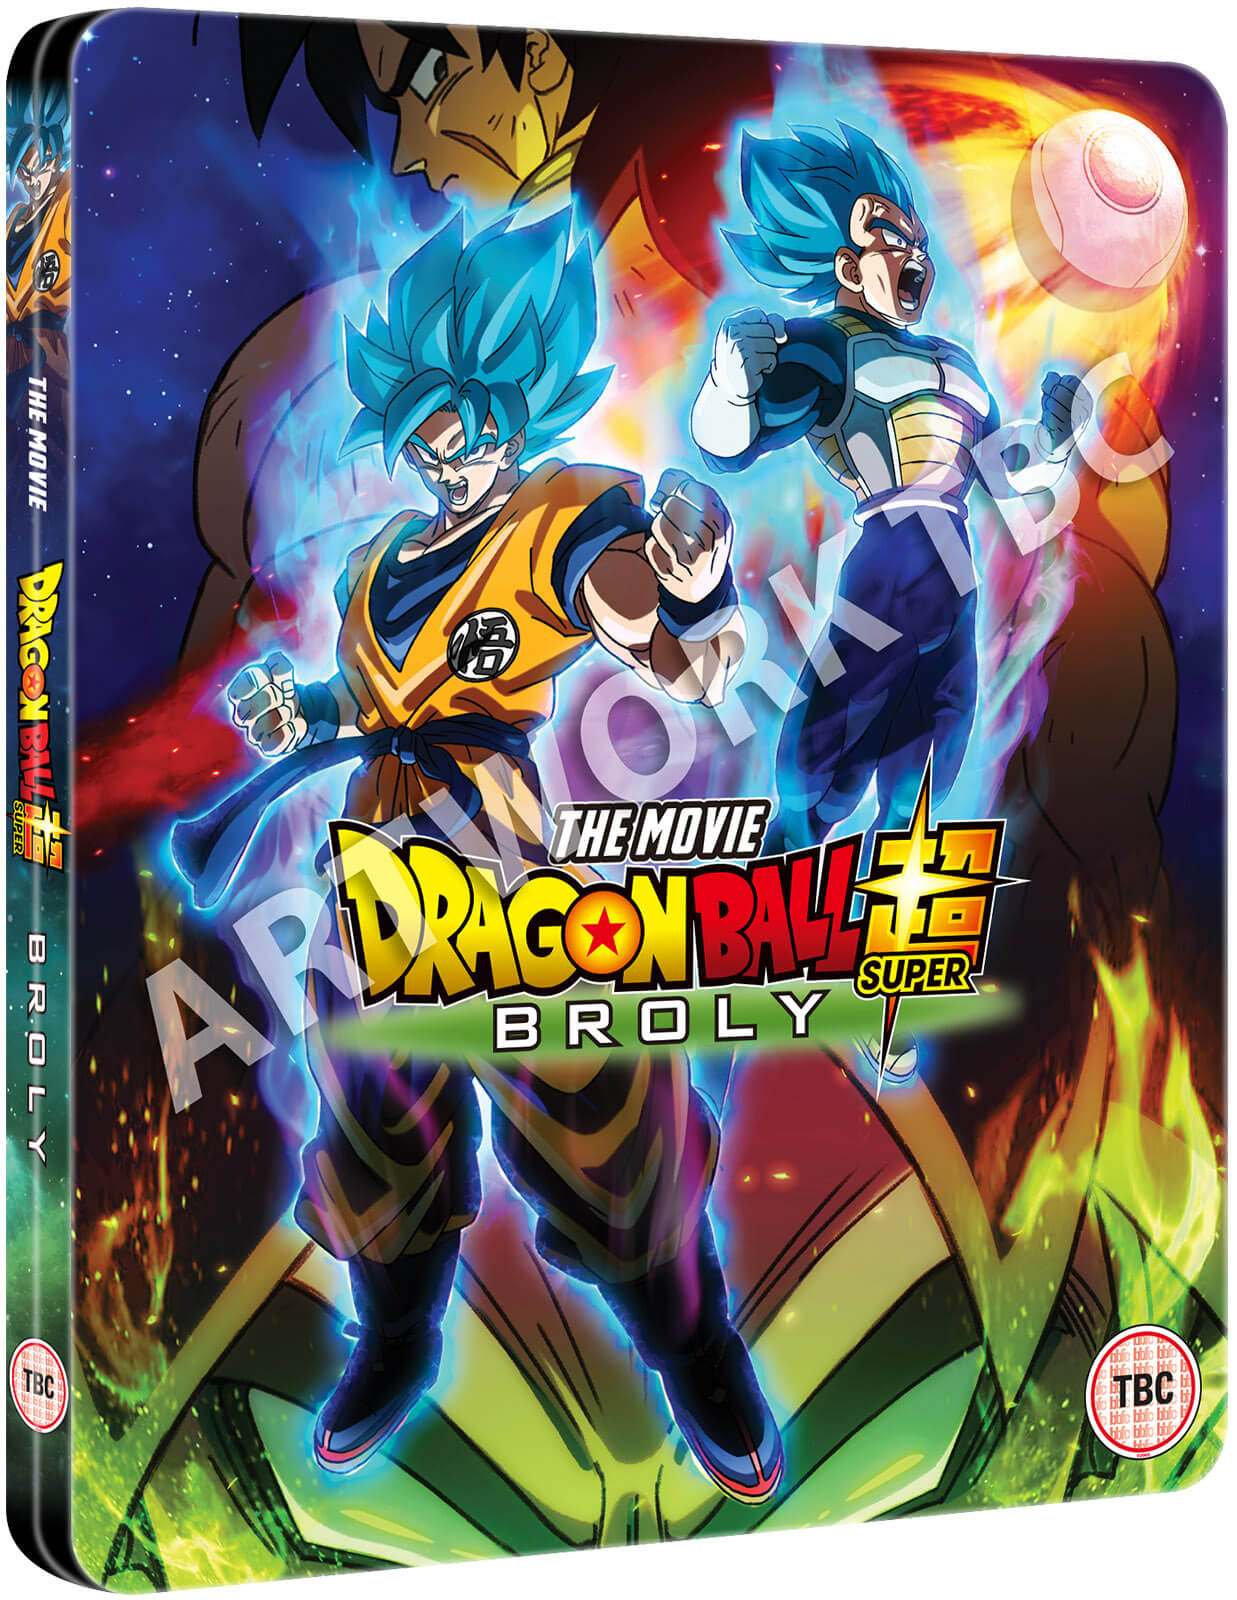 Dragon Ball Super The Movie: Broly SteelBook